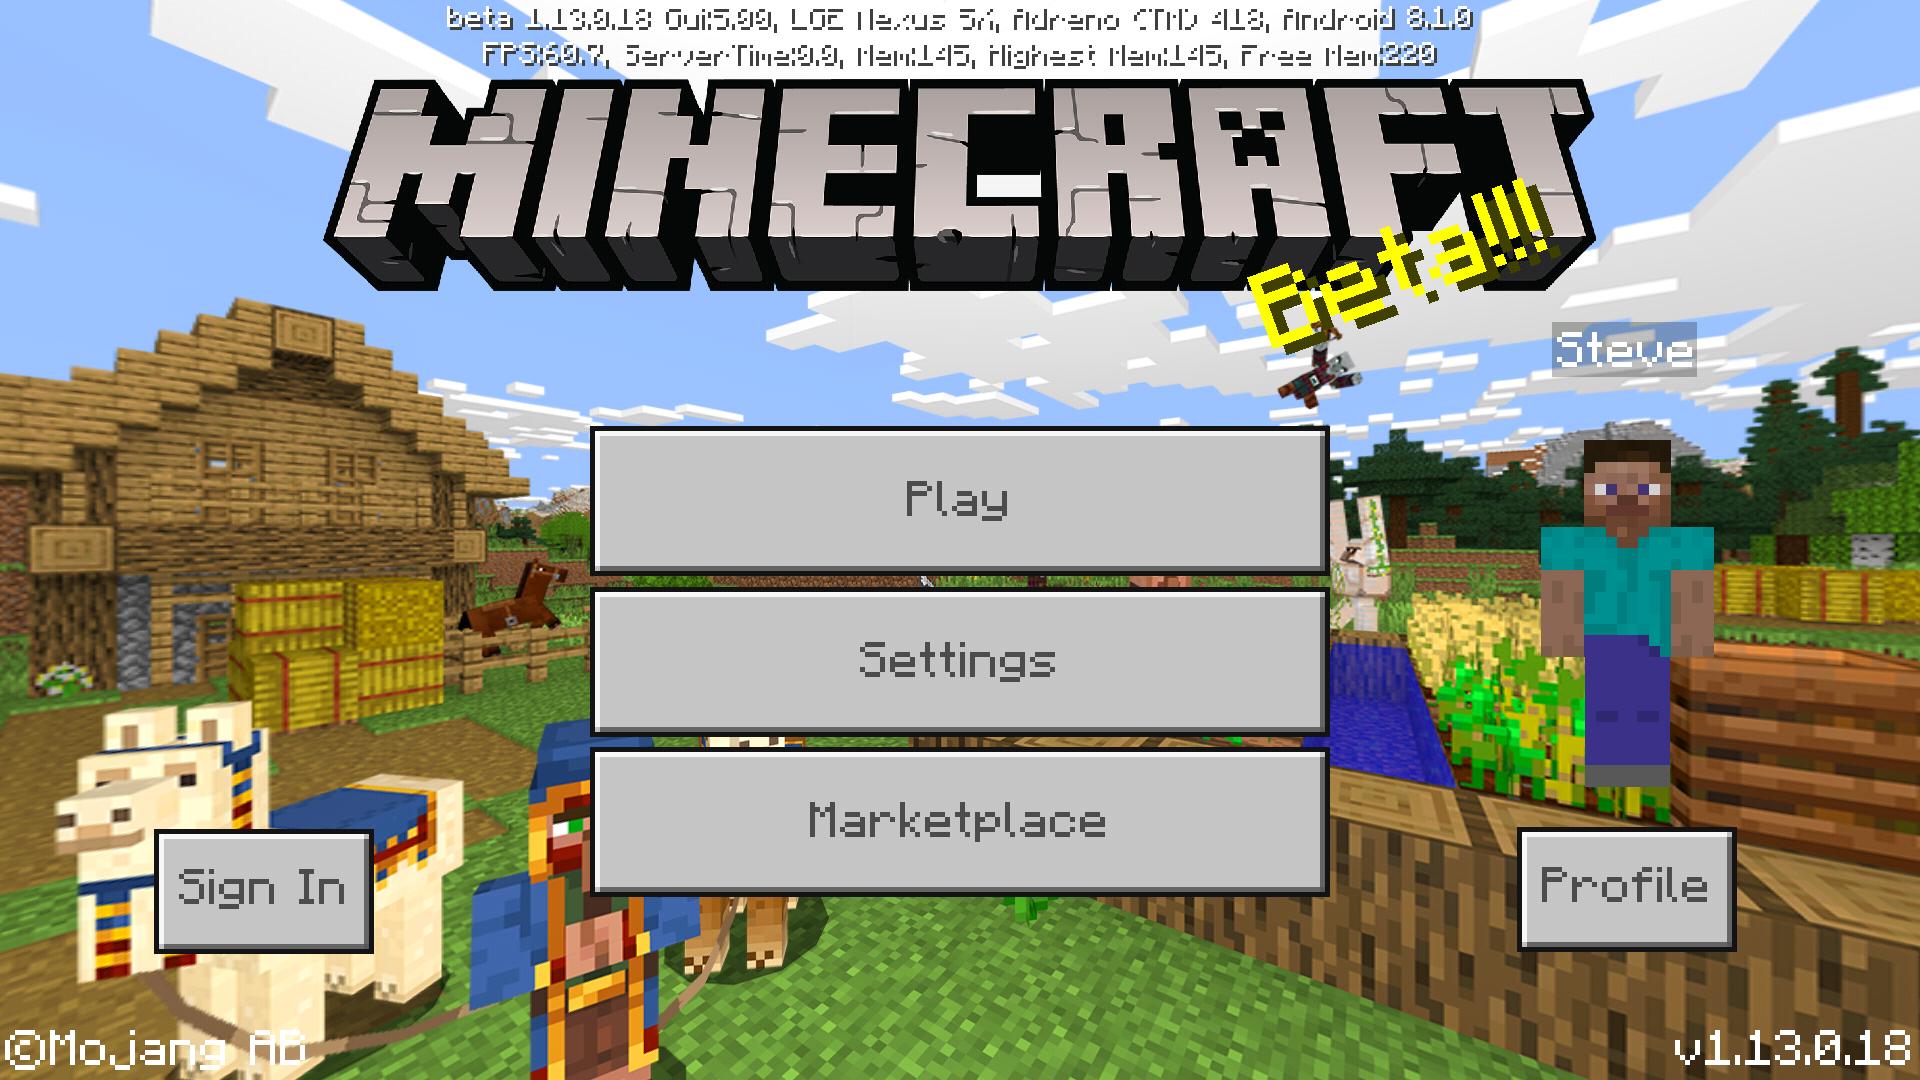 Bedrock Edition beta 1 13 0 18 Official Minecraft Wiki